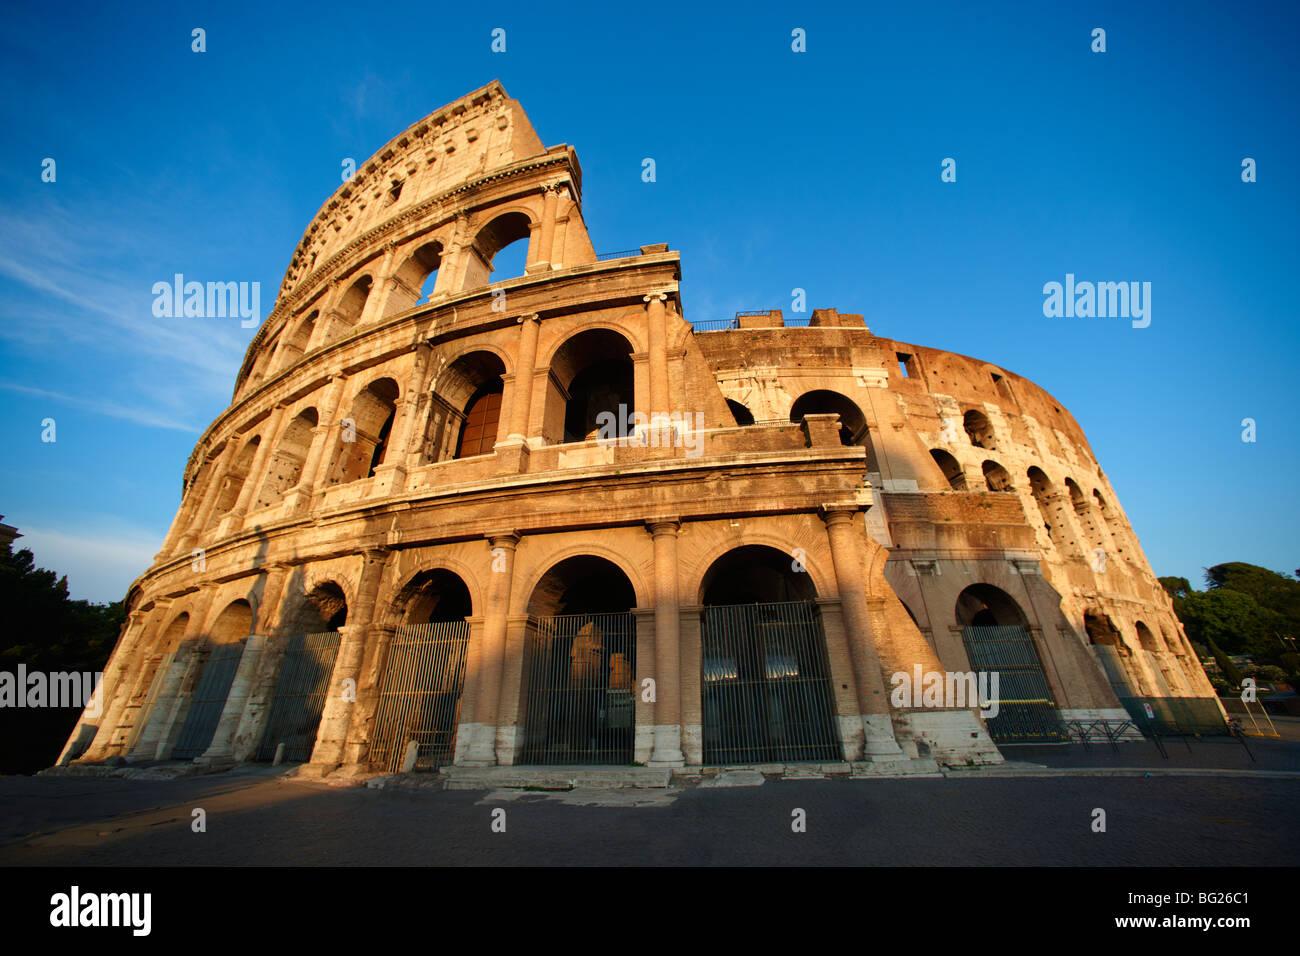 El Coliseo (Colosseo) . Roma Imagen De Stock